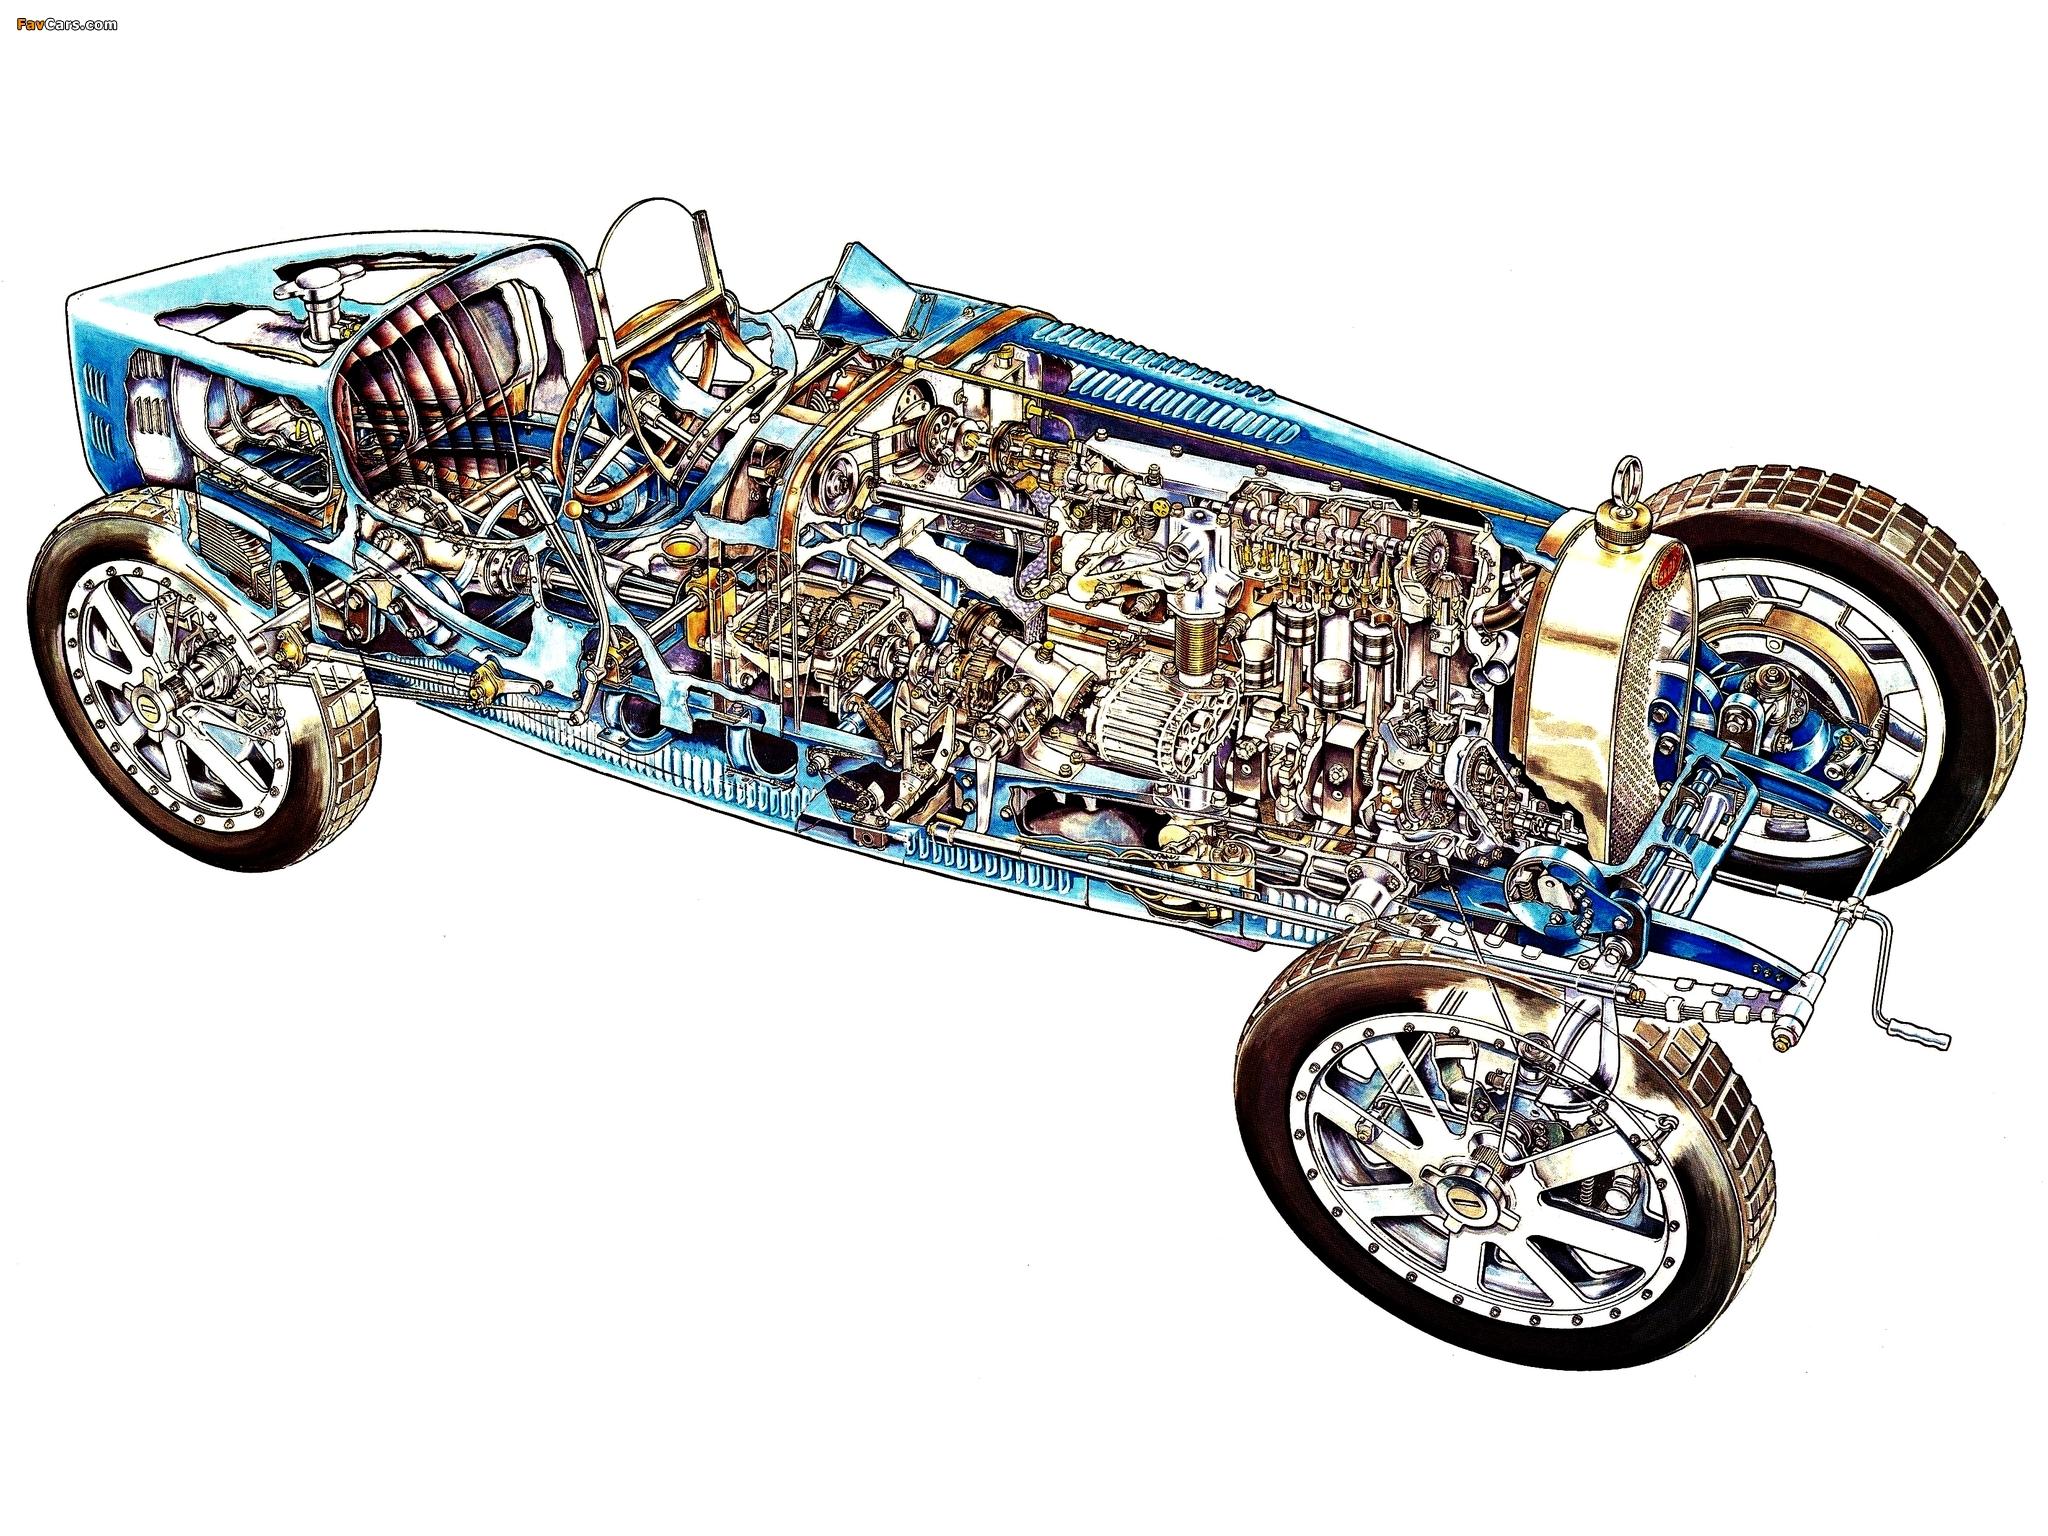 2048x1536 Car Wallpapers Bugatti Type 35 1924 30 Wallpapers 2048x1536